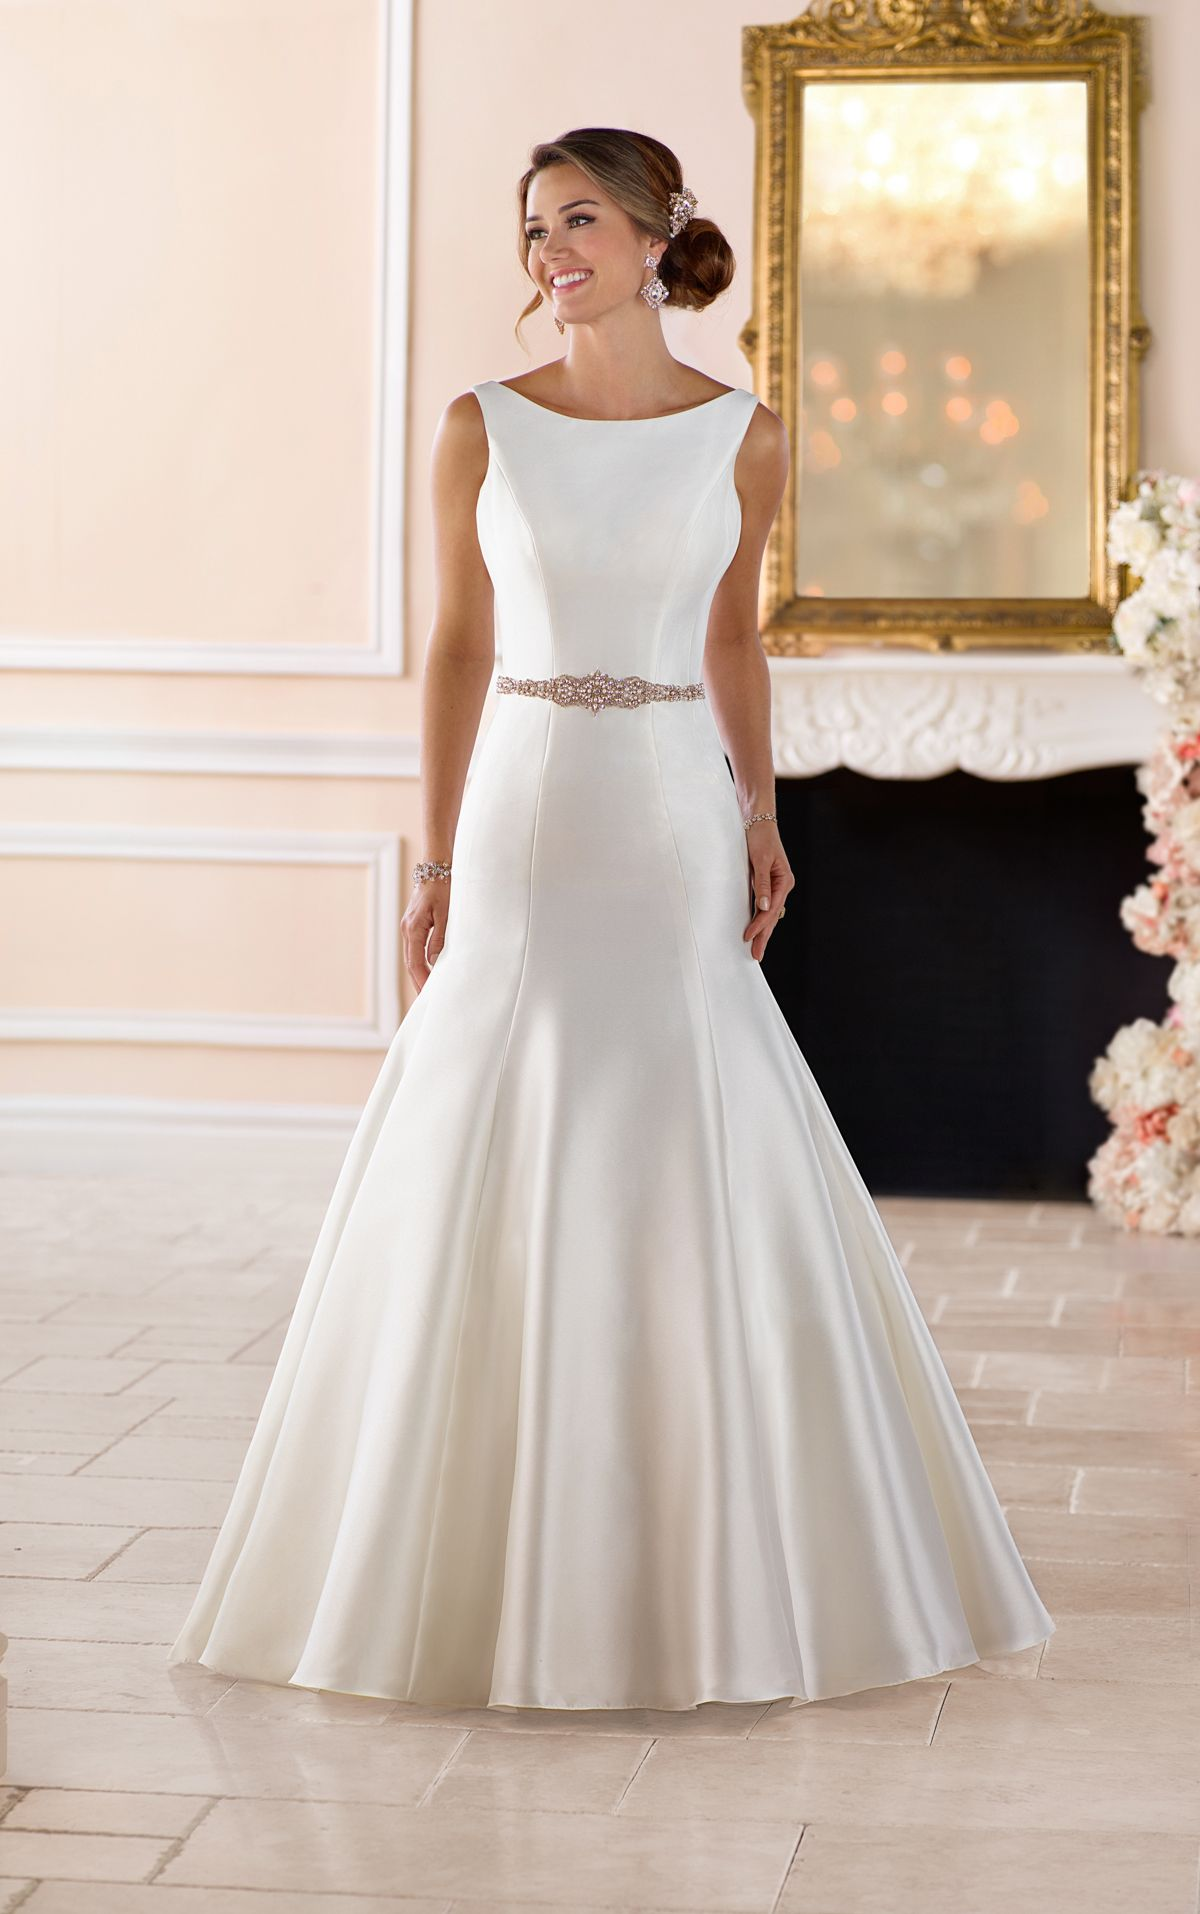 Boat neck wedding dress with deep v back boat neck wedding dress boat neck wedding dress with deep v back ombrellifo Choice Image